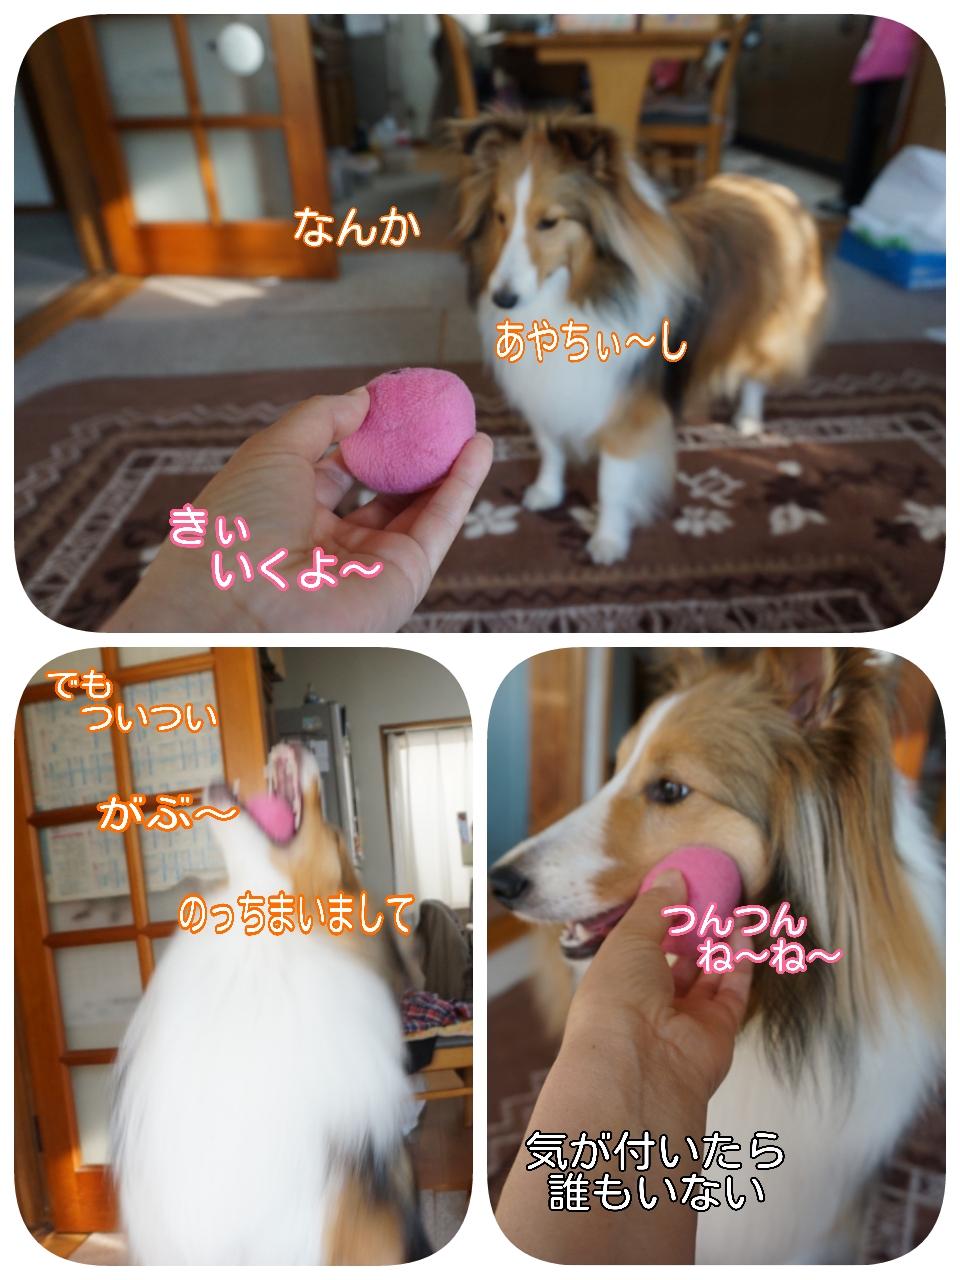 2015-04-06-09-00-51_deco.jpg